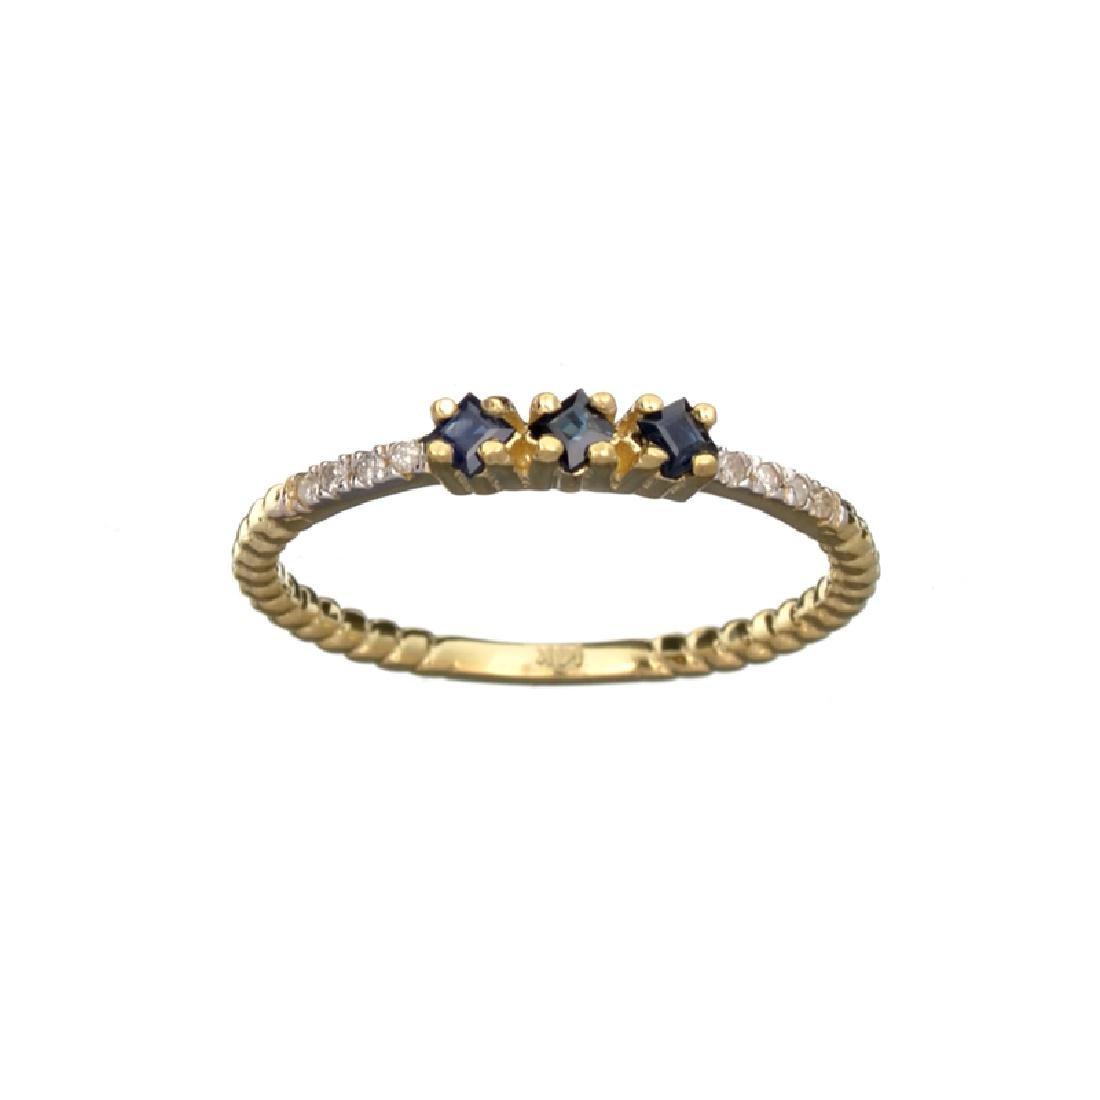 APP: 0.6k Fine Jewelry 14 KT Gold, 0.23CT Blue Sapphire